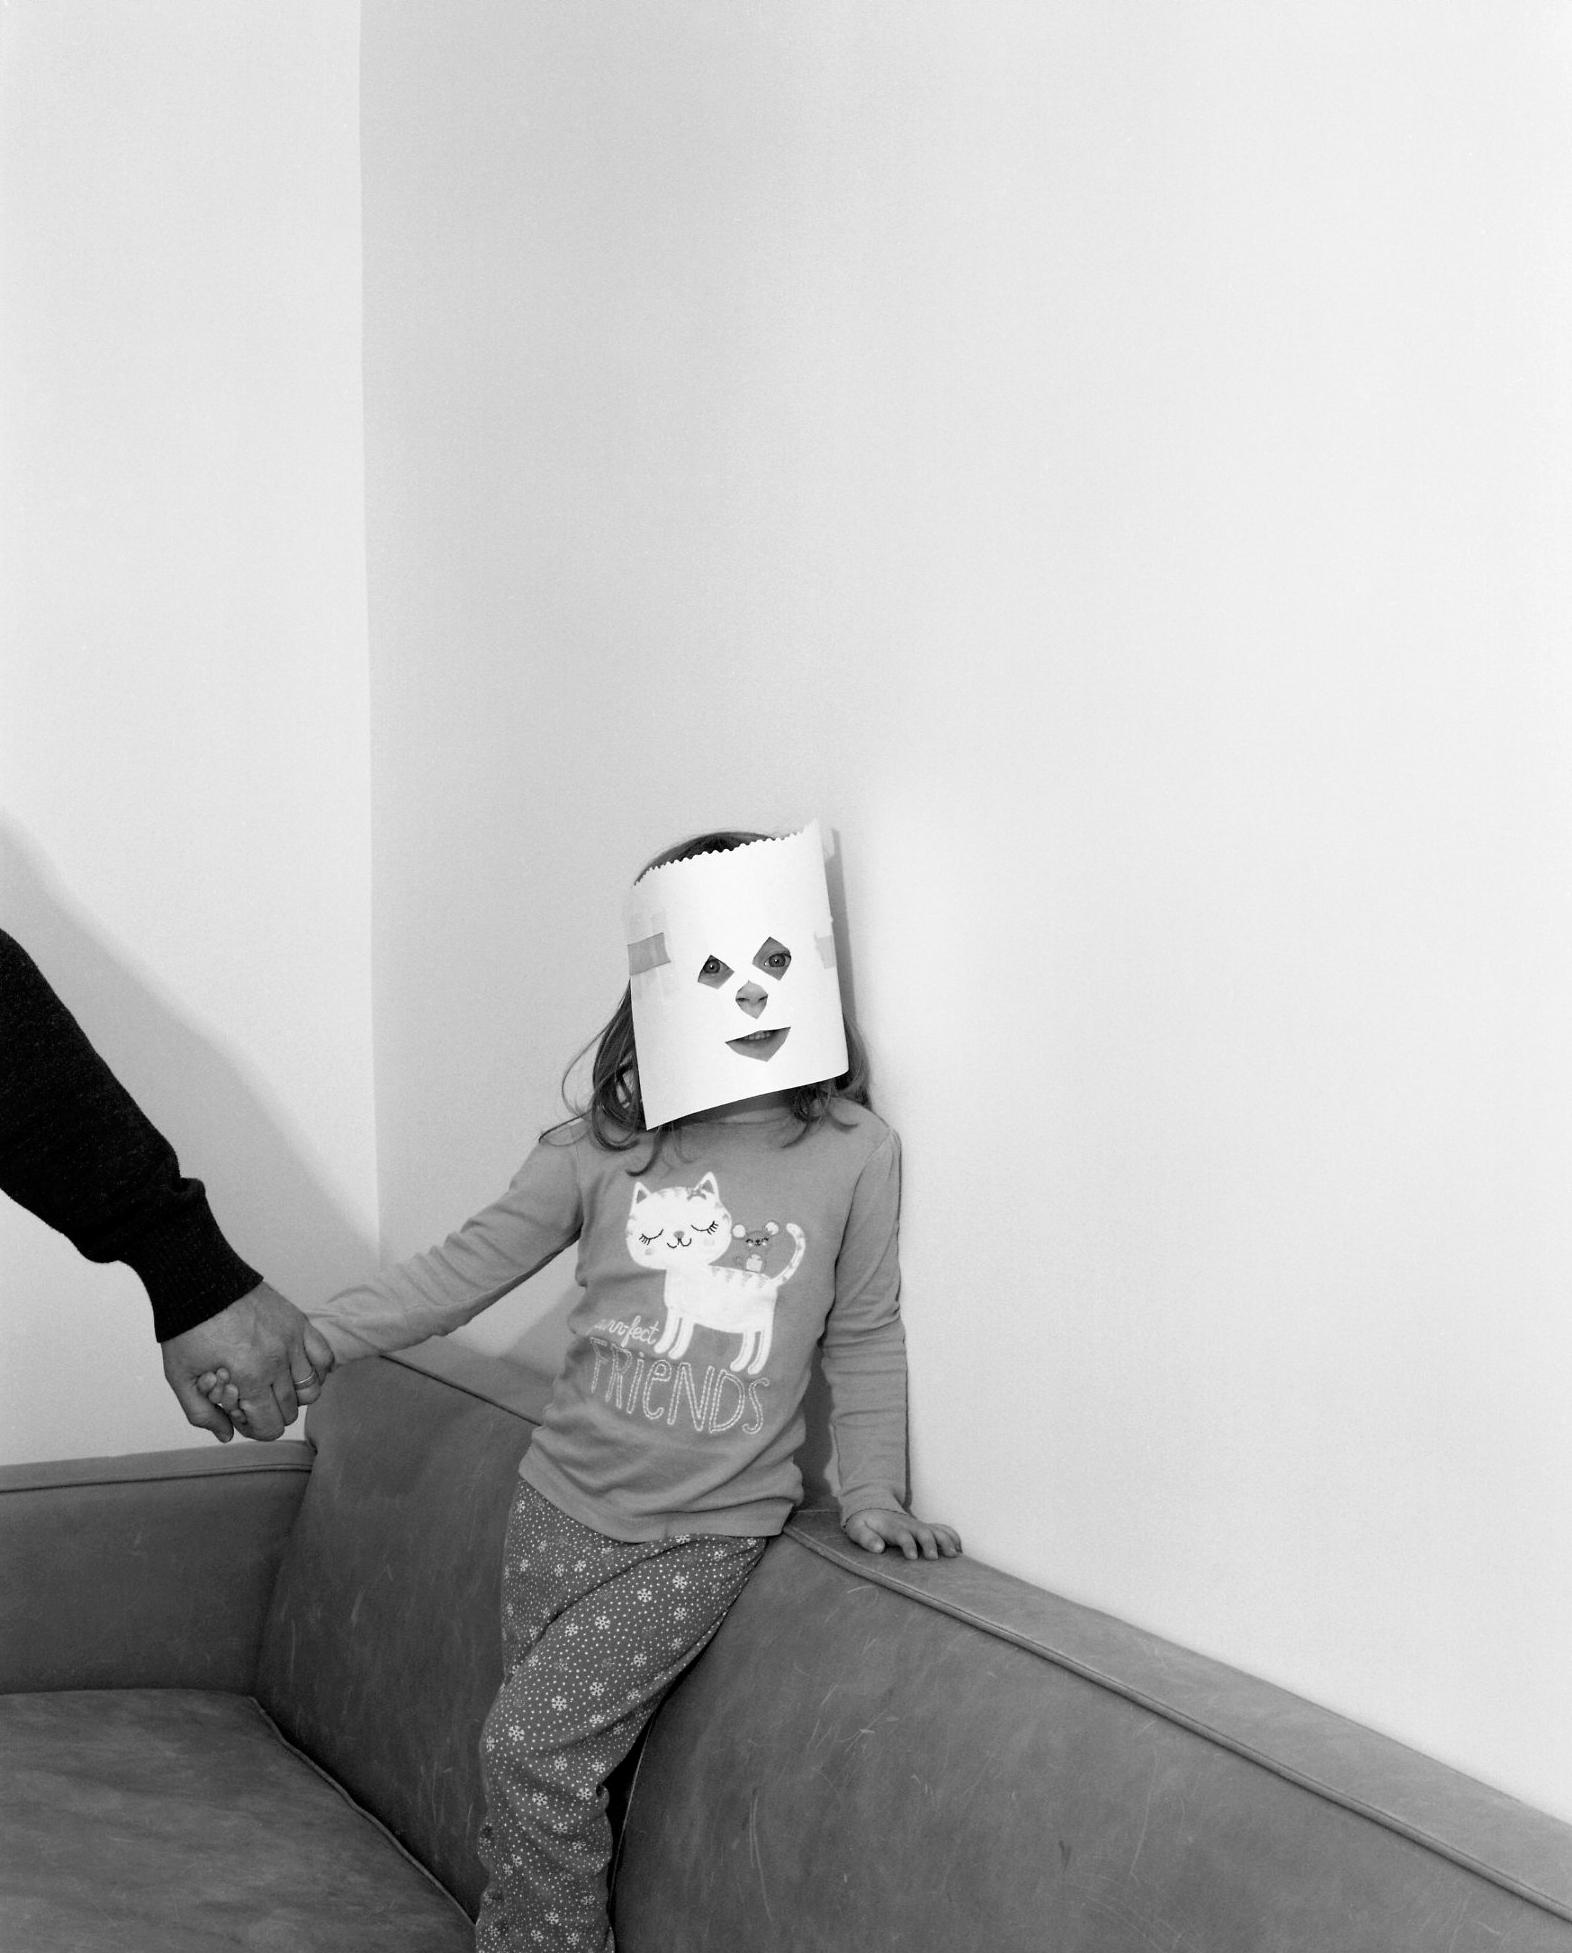 Mask, 2018